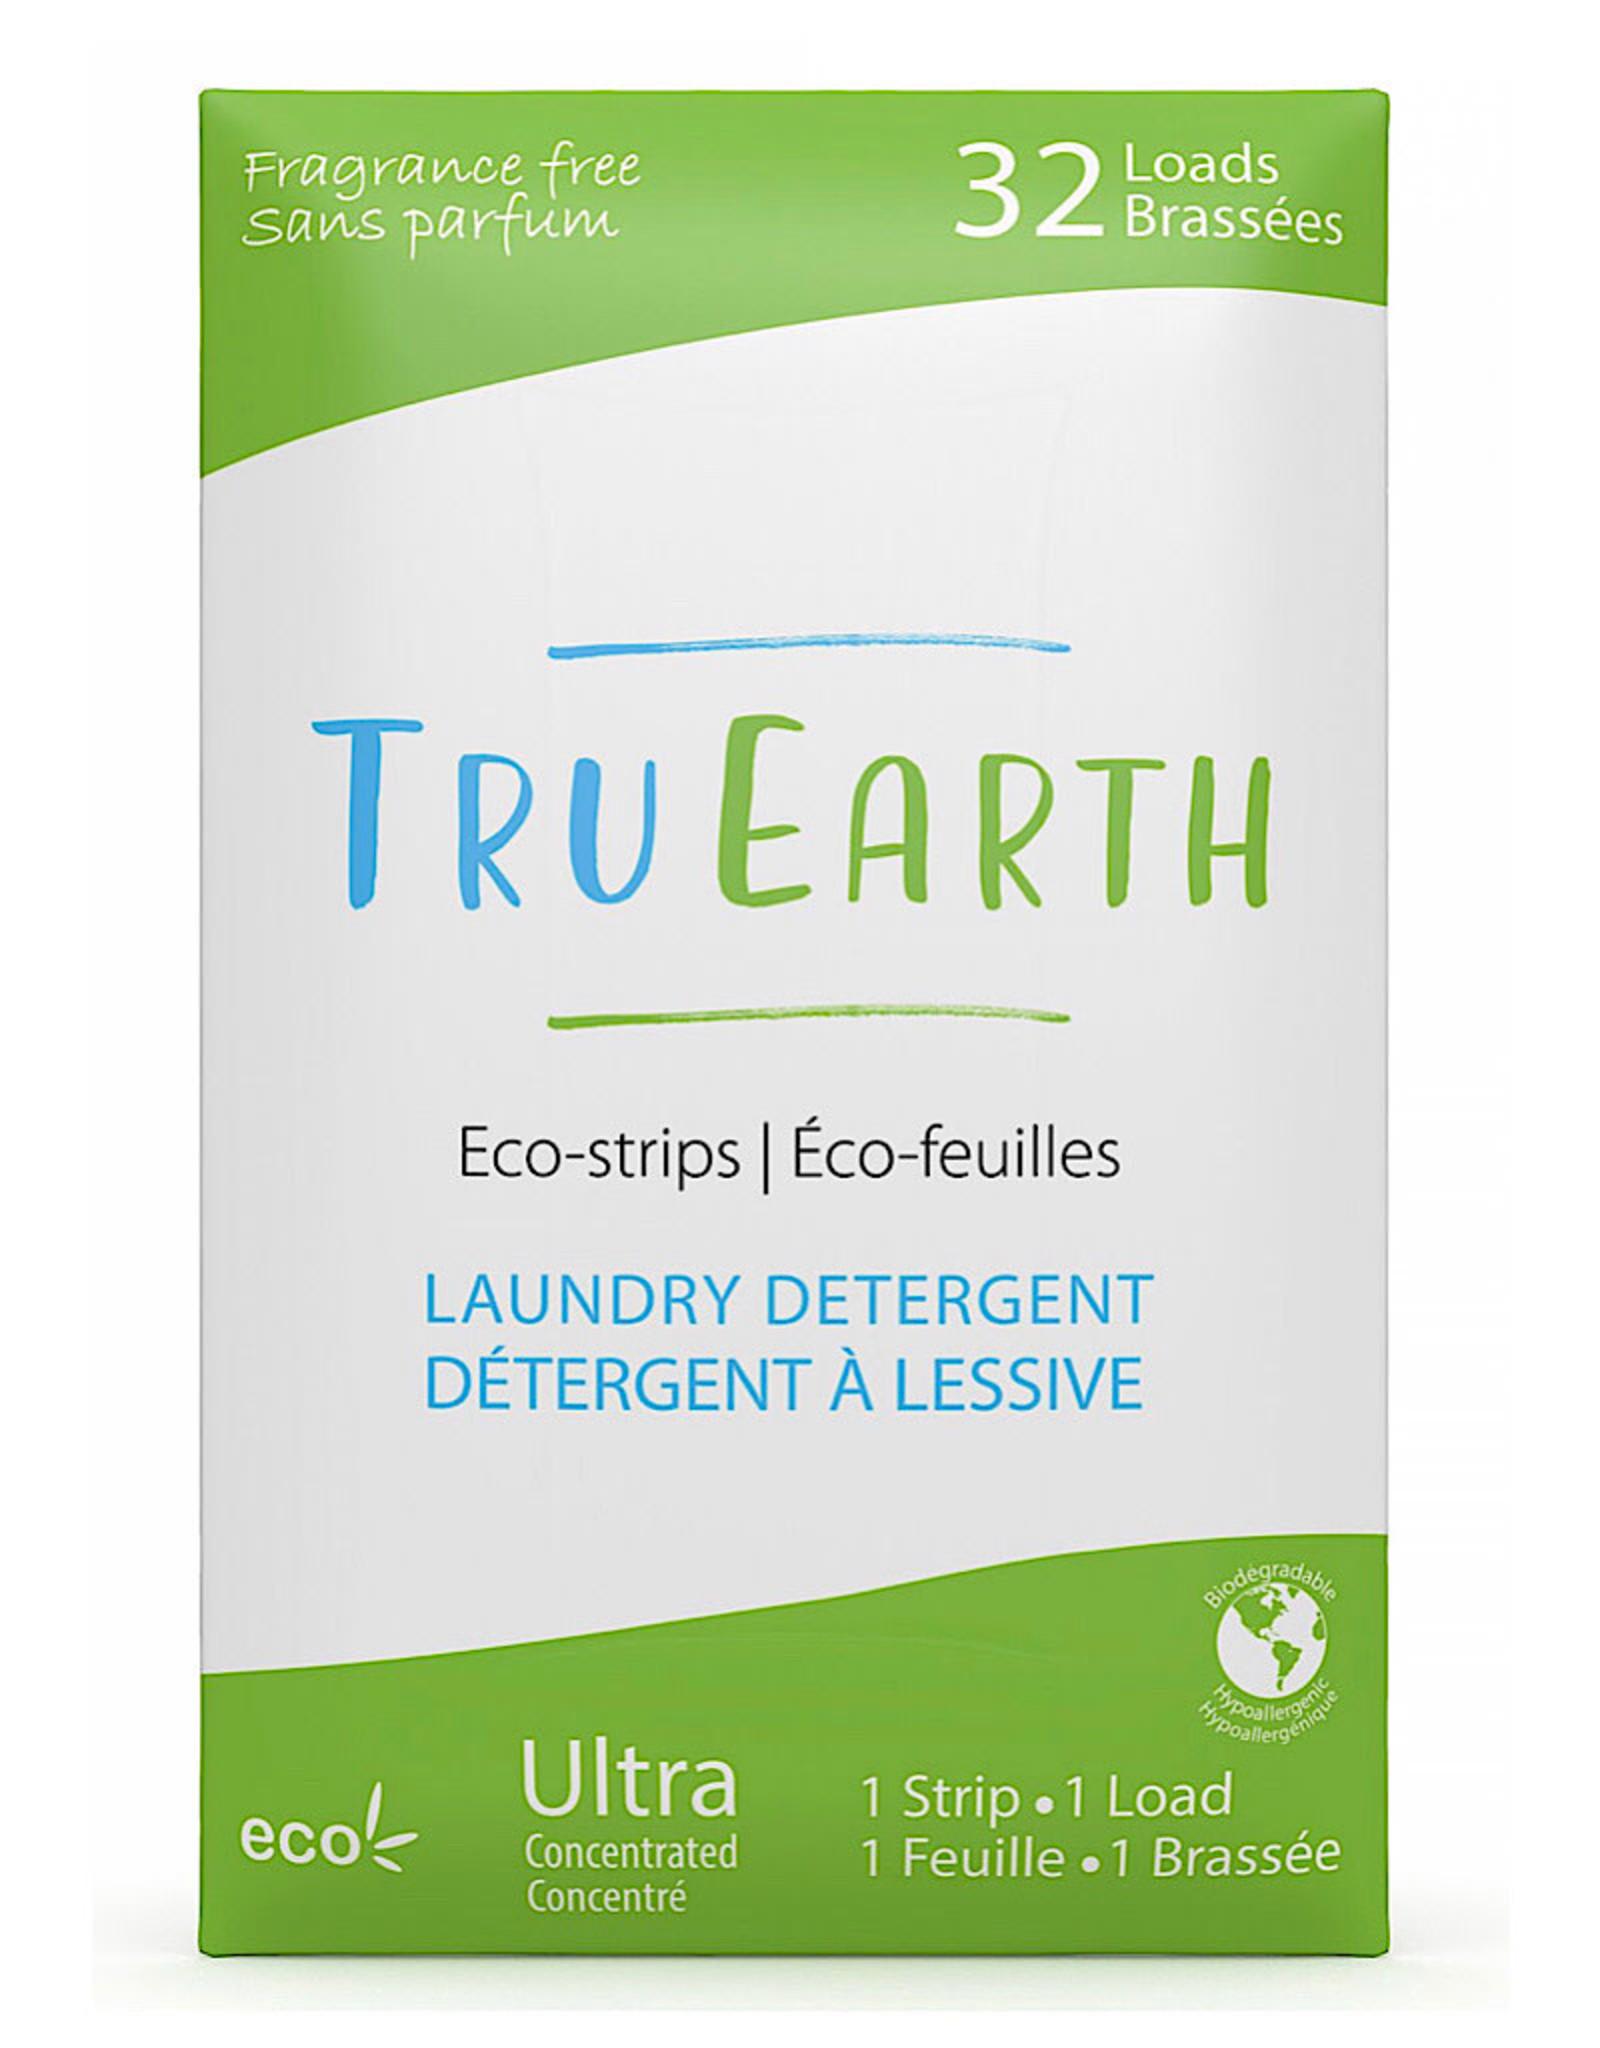 Tru Earth Eco-Strip 32 Loads Reg 16.00 SALE